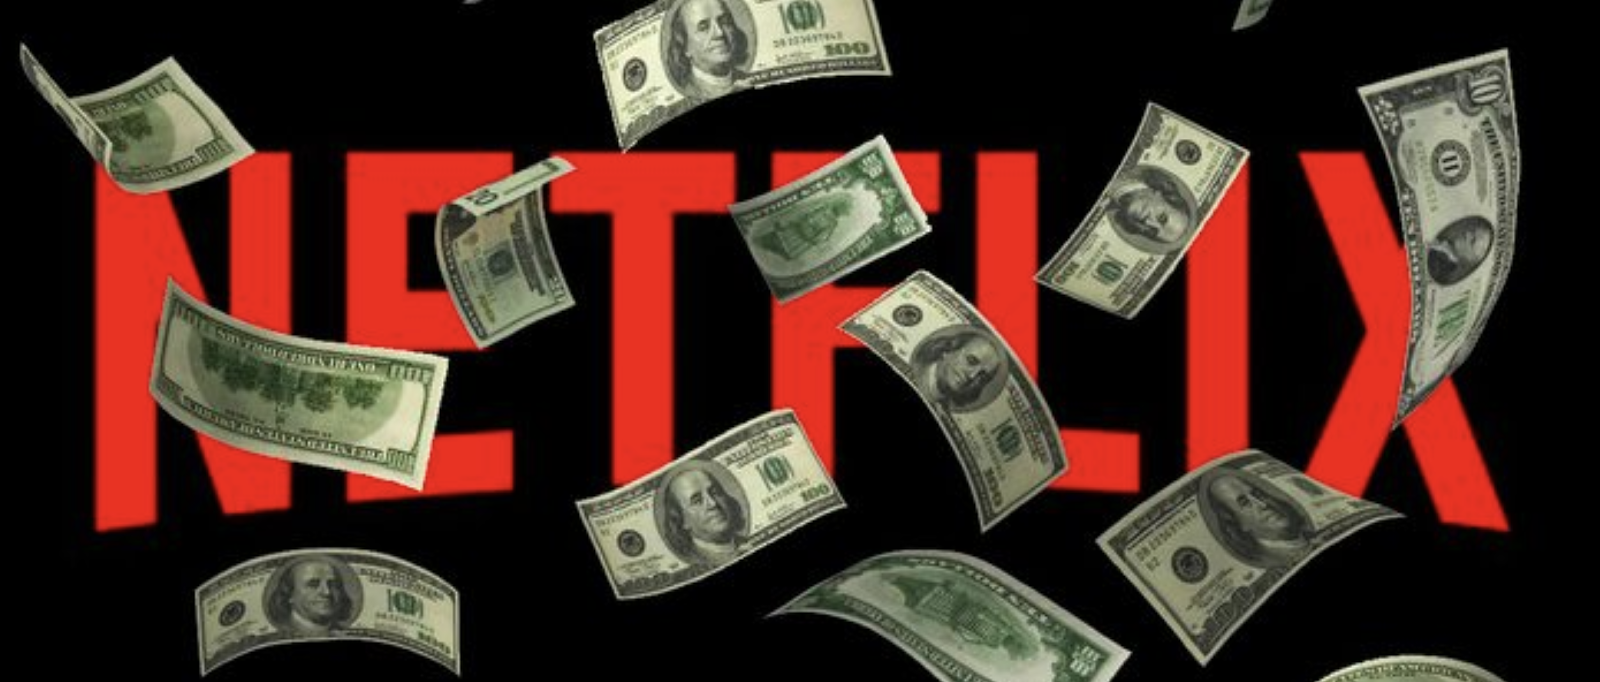 ¿Posible adiós a 'Netflix'? El gigante audiovisual acumula una deuda billonaria